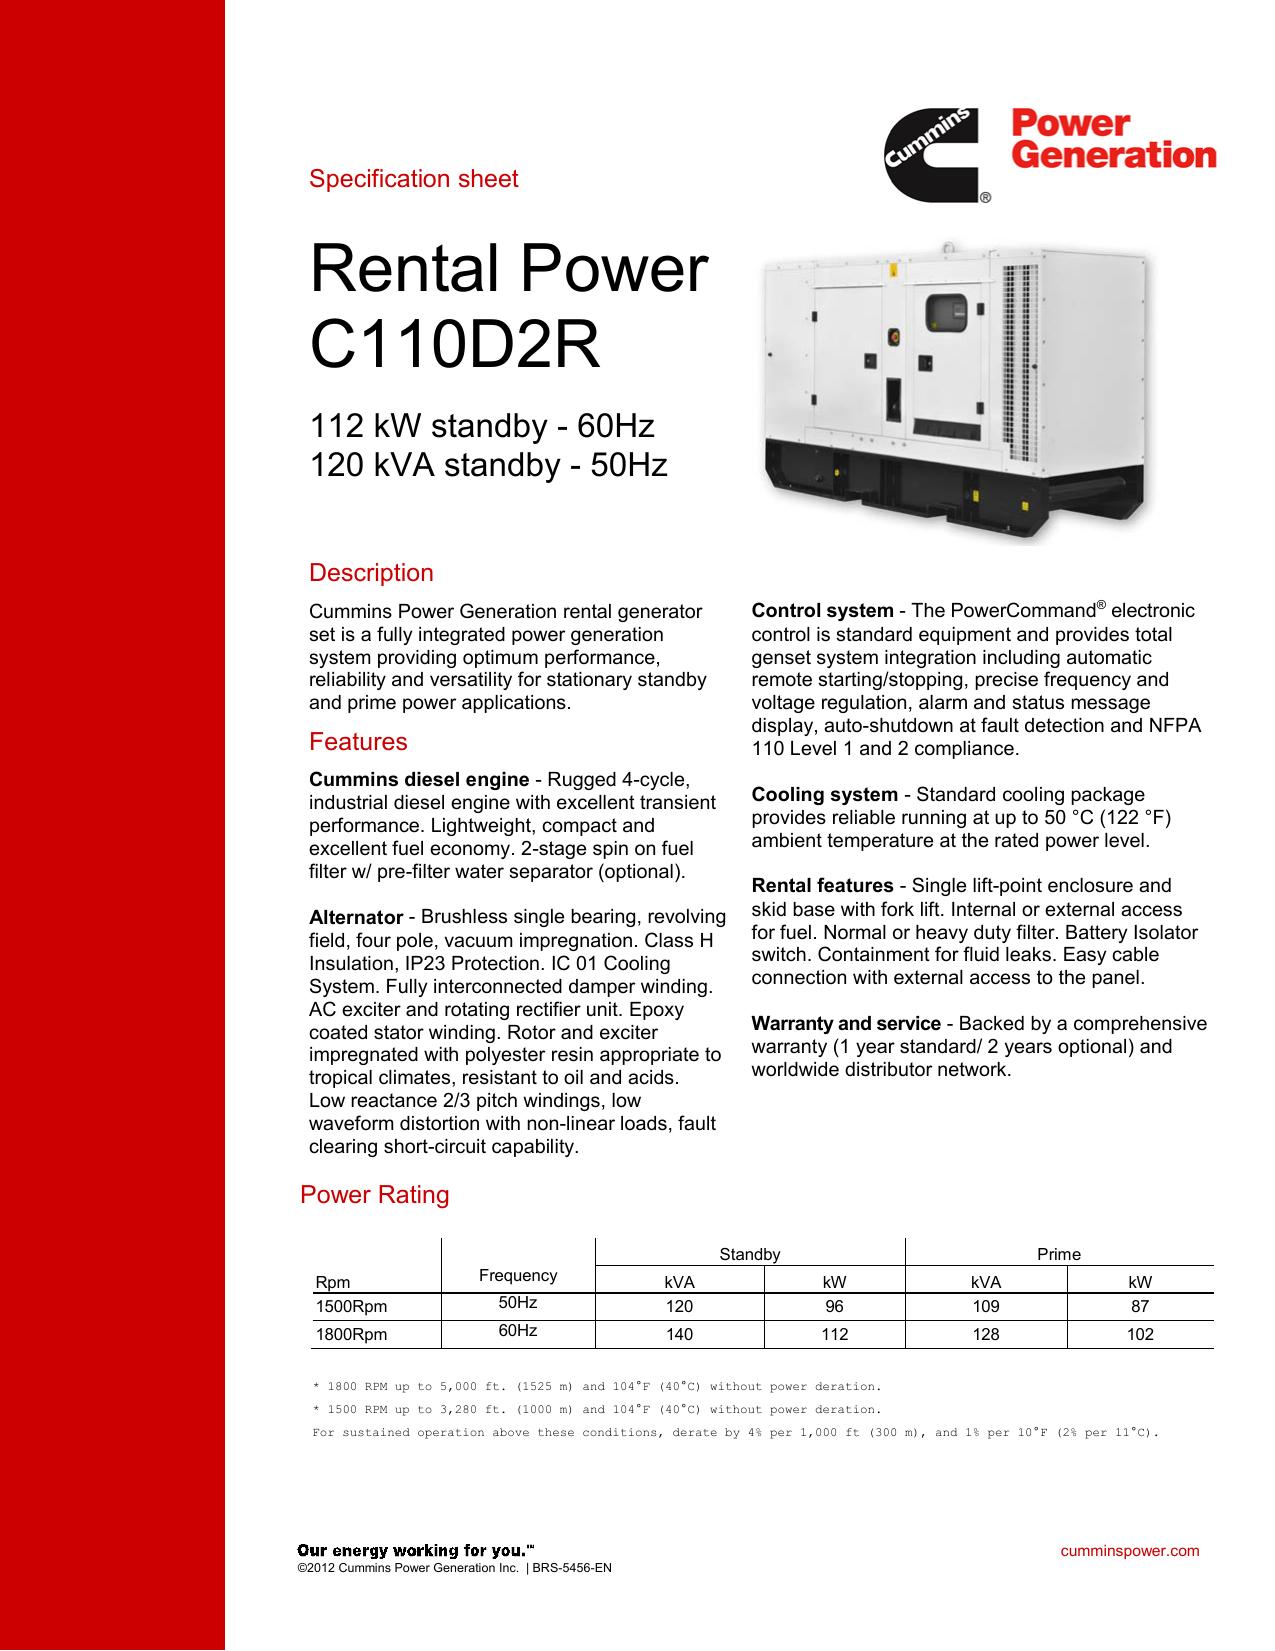 Rental Power C110D2R - Cummins Power Generation   manualzz com